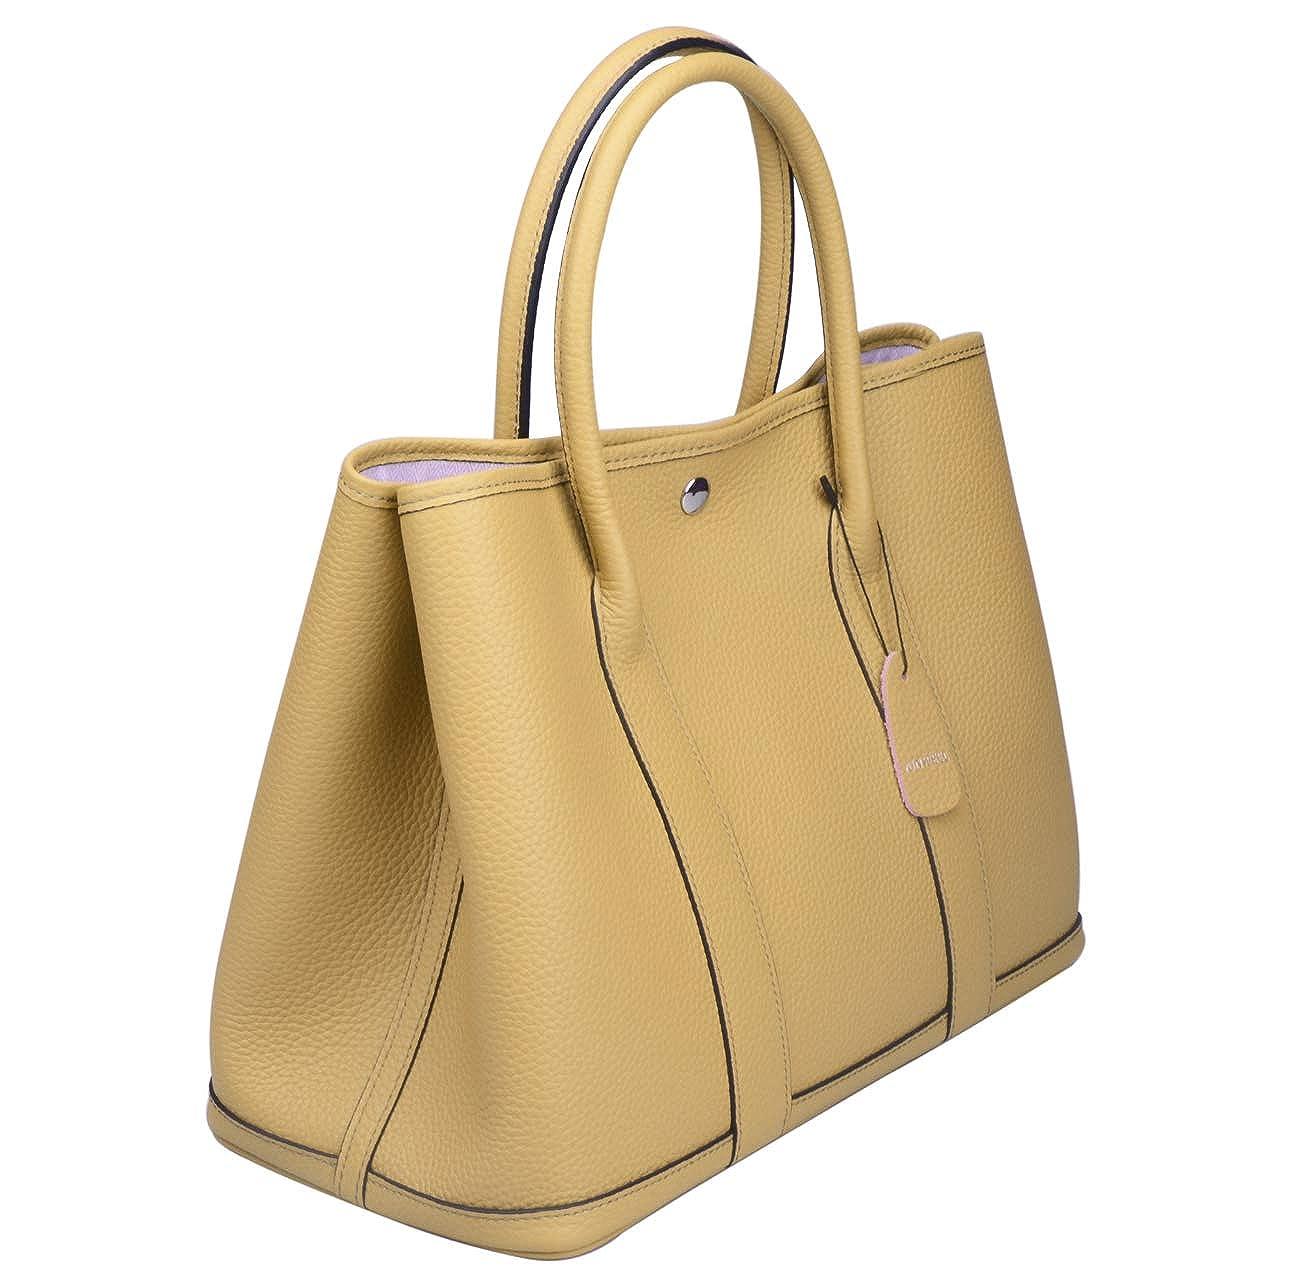 Ainifeel Women s Genuine Leather Tote Bag Top Handle Handbags (Apricot)   Handbags  Amazon.com